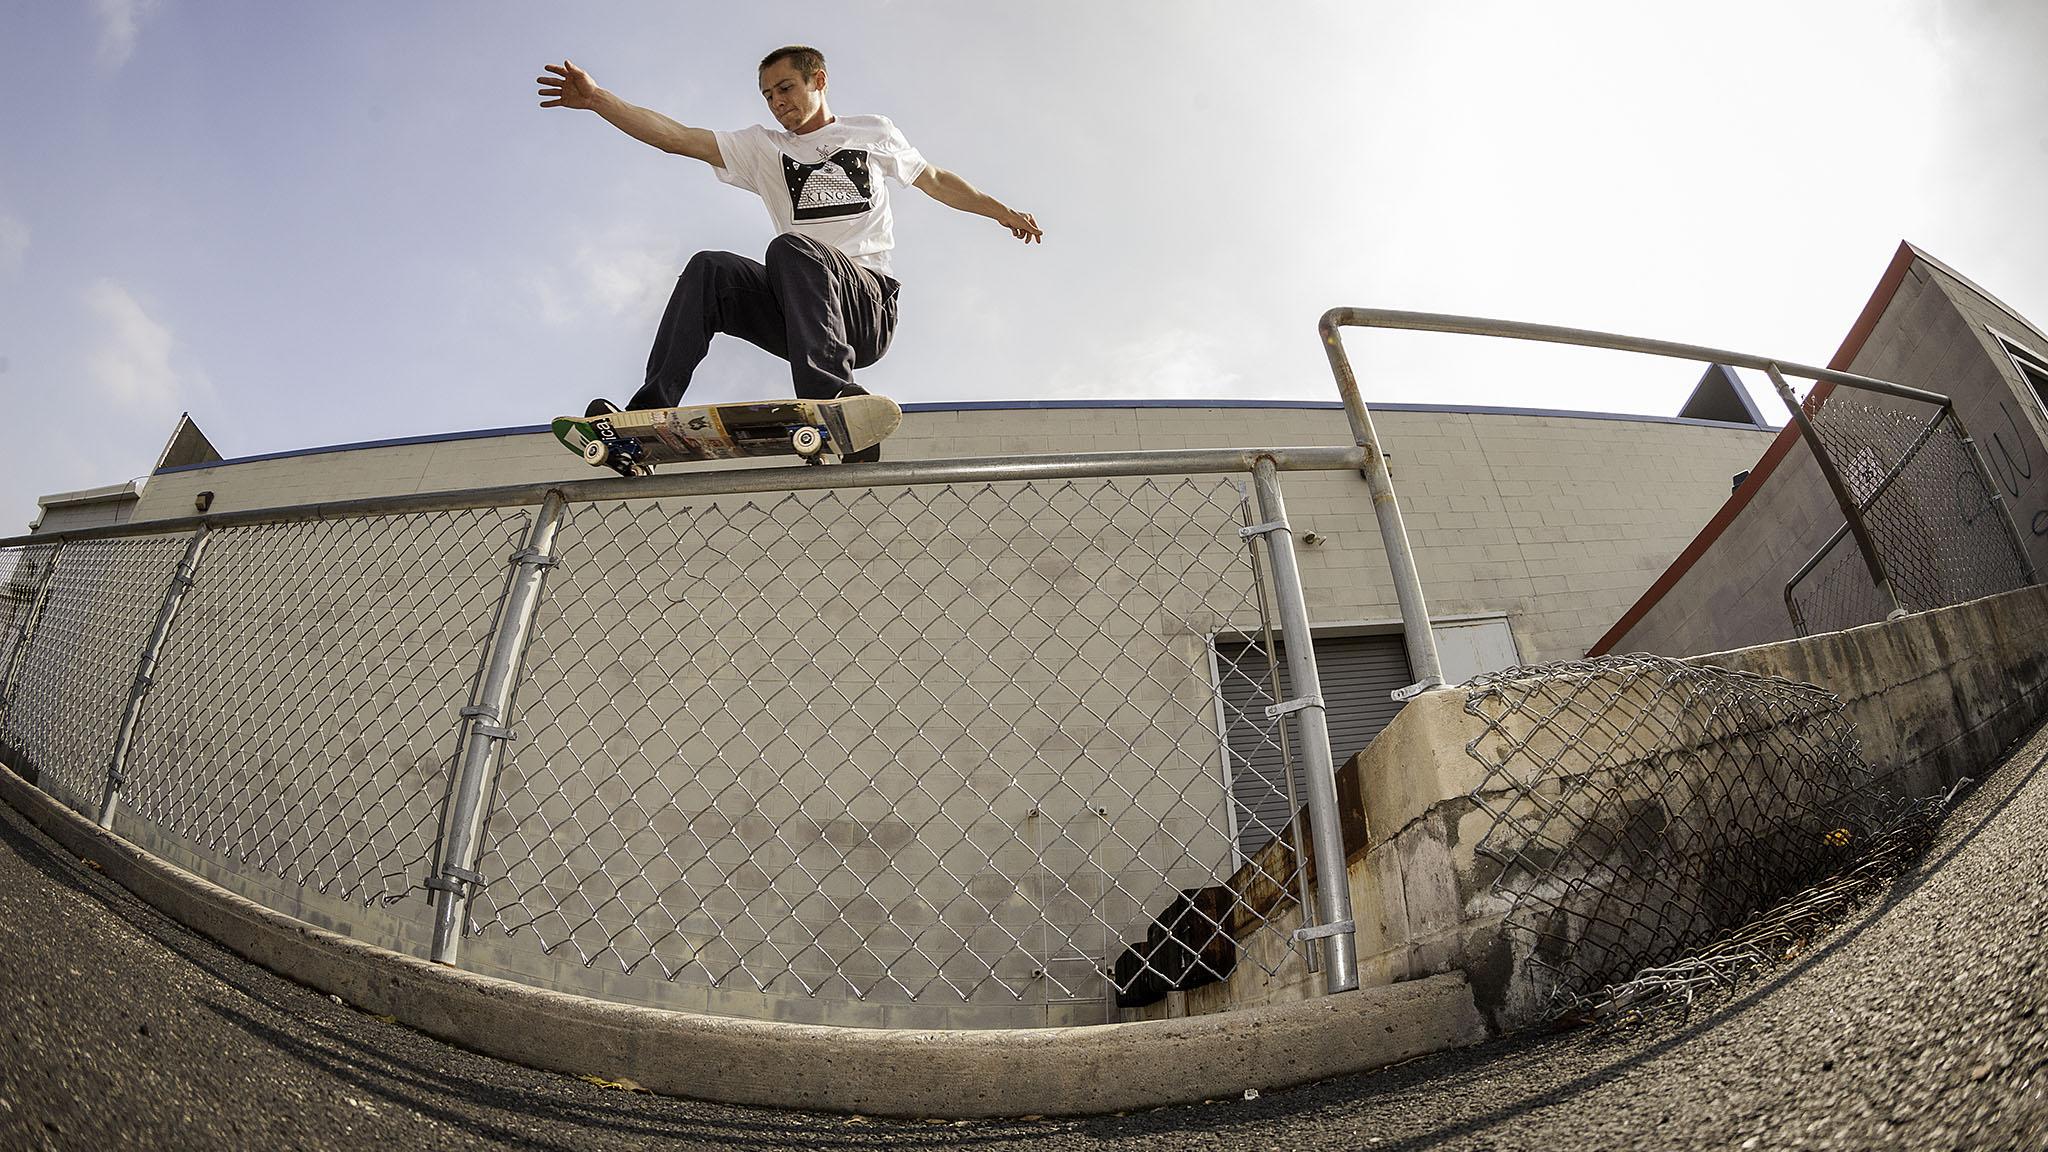 Curren Caples And Louie Lopez Turn Pro Deck Skateboard Flip Louis